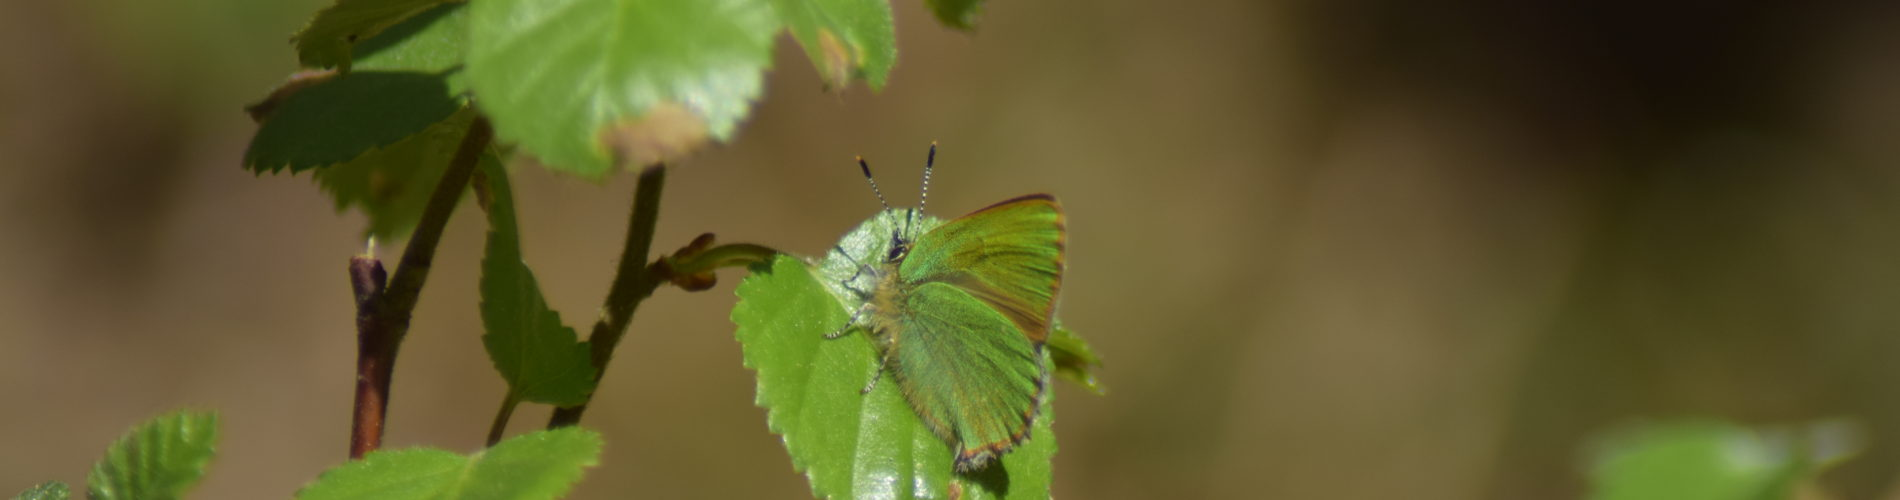 Grøn Busksommerfugl (Callophrys rubi) på Dunbirk (Betula pubescens), ved Farum Sortmose.